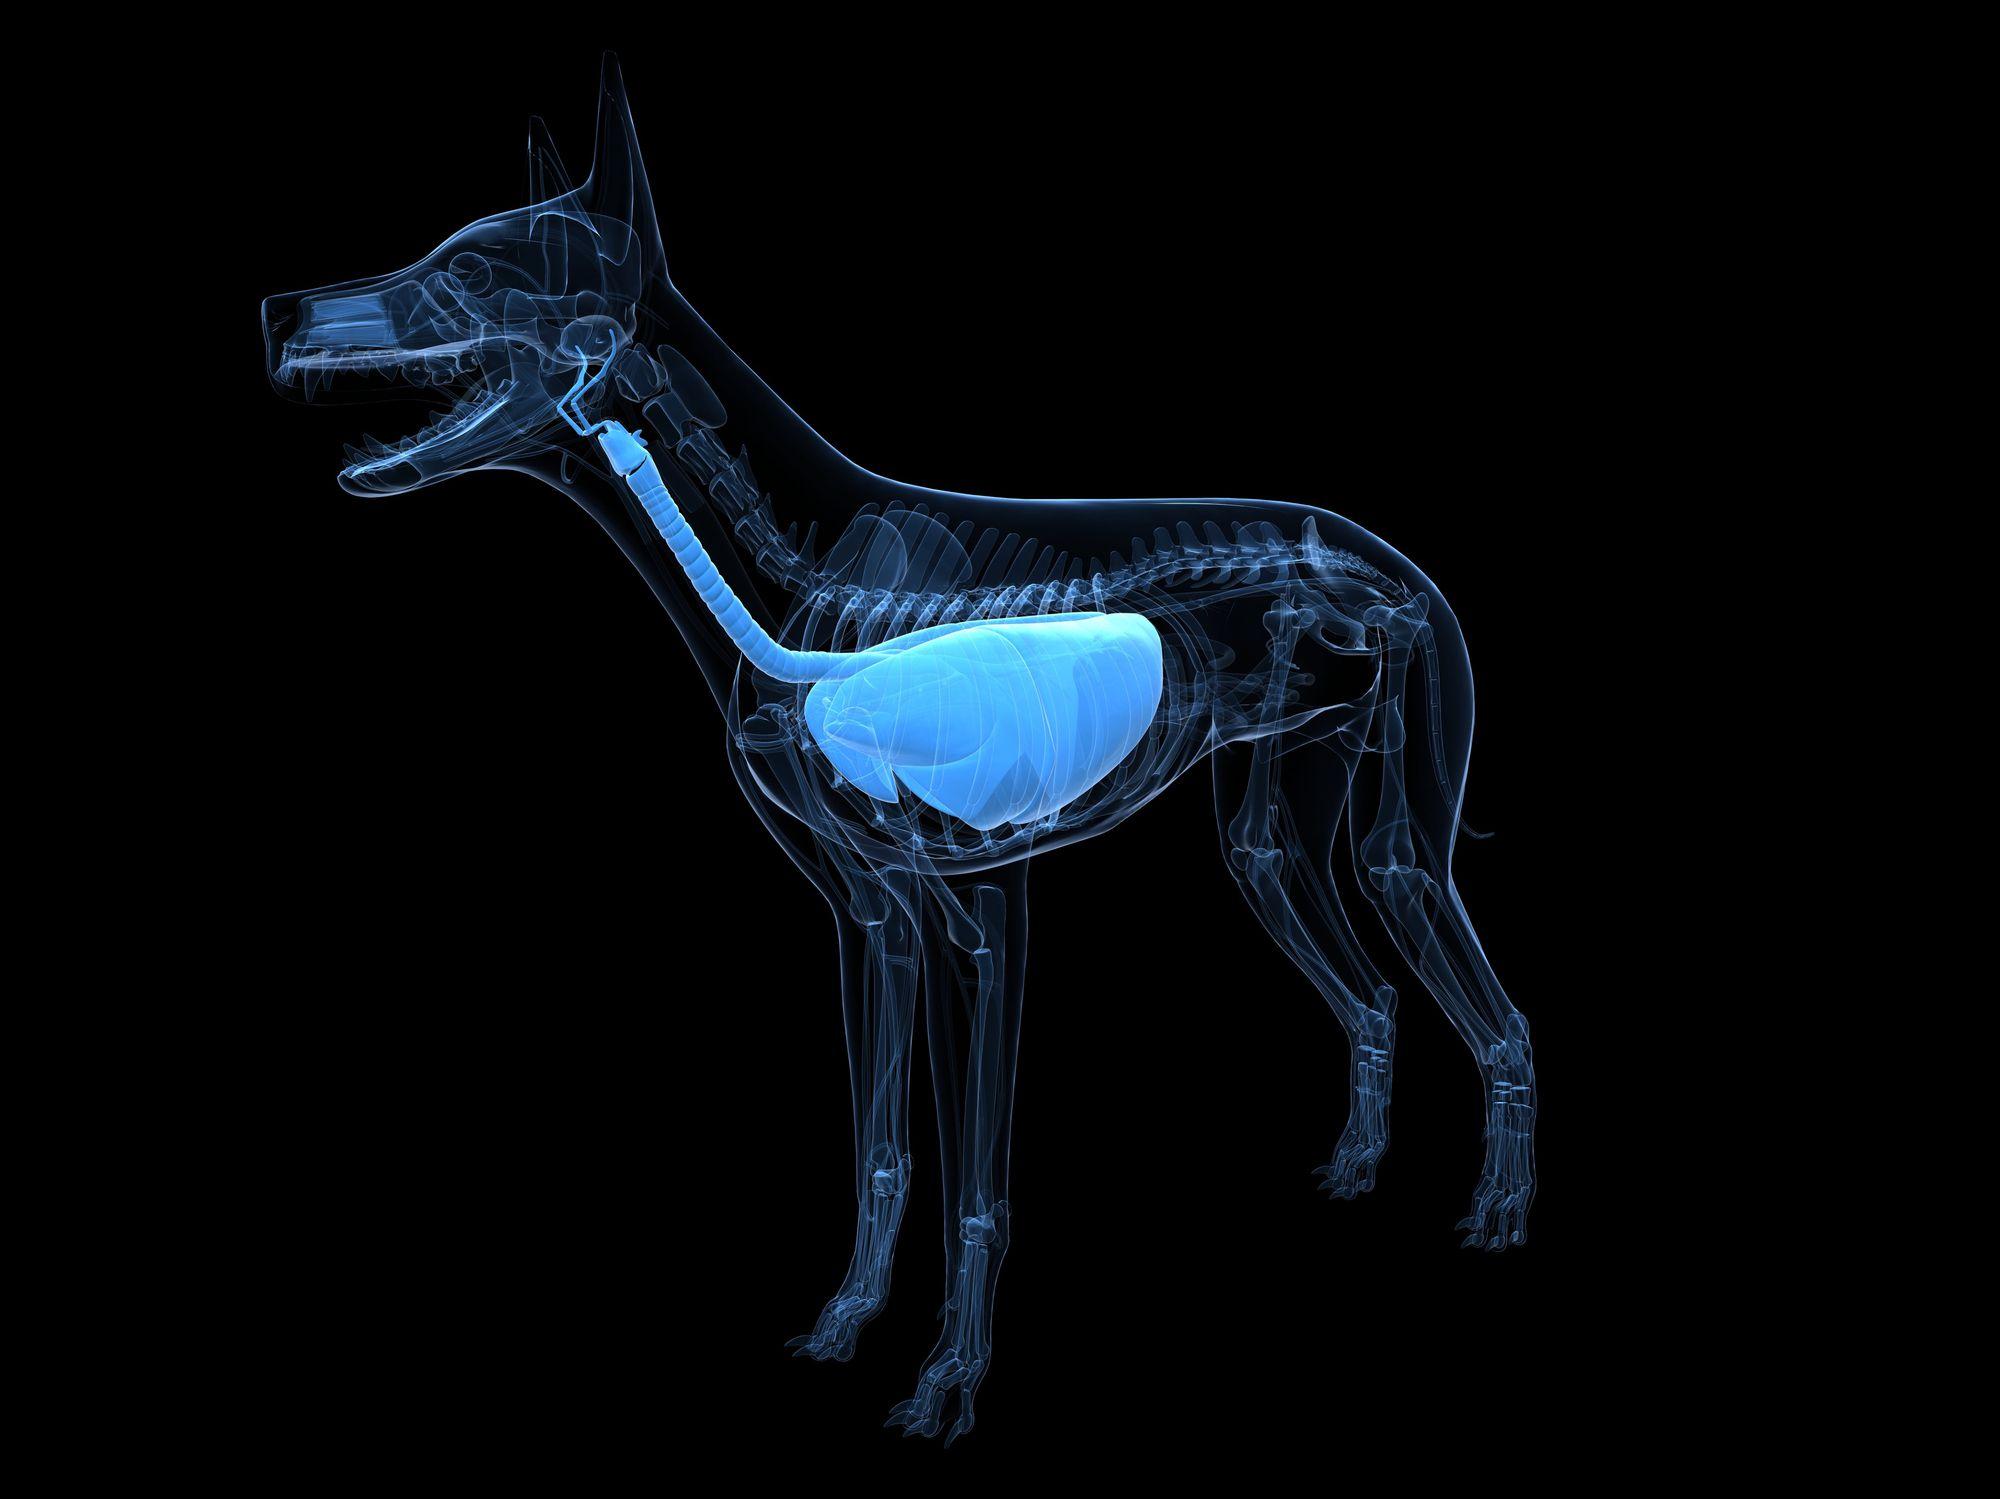 Dog respiratory system